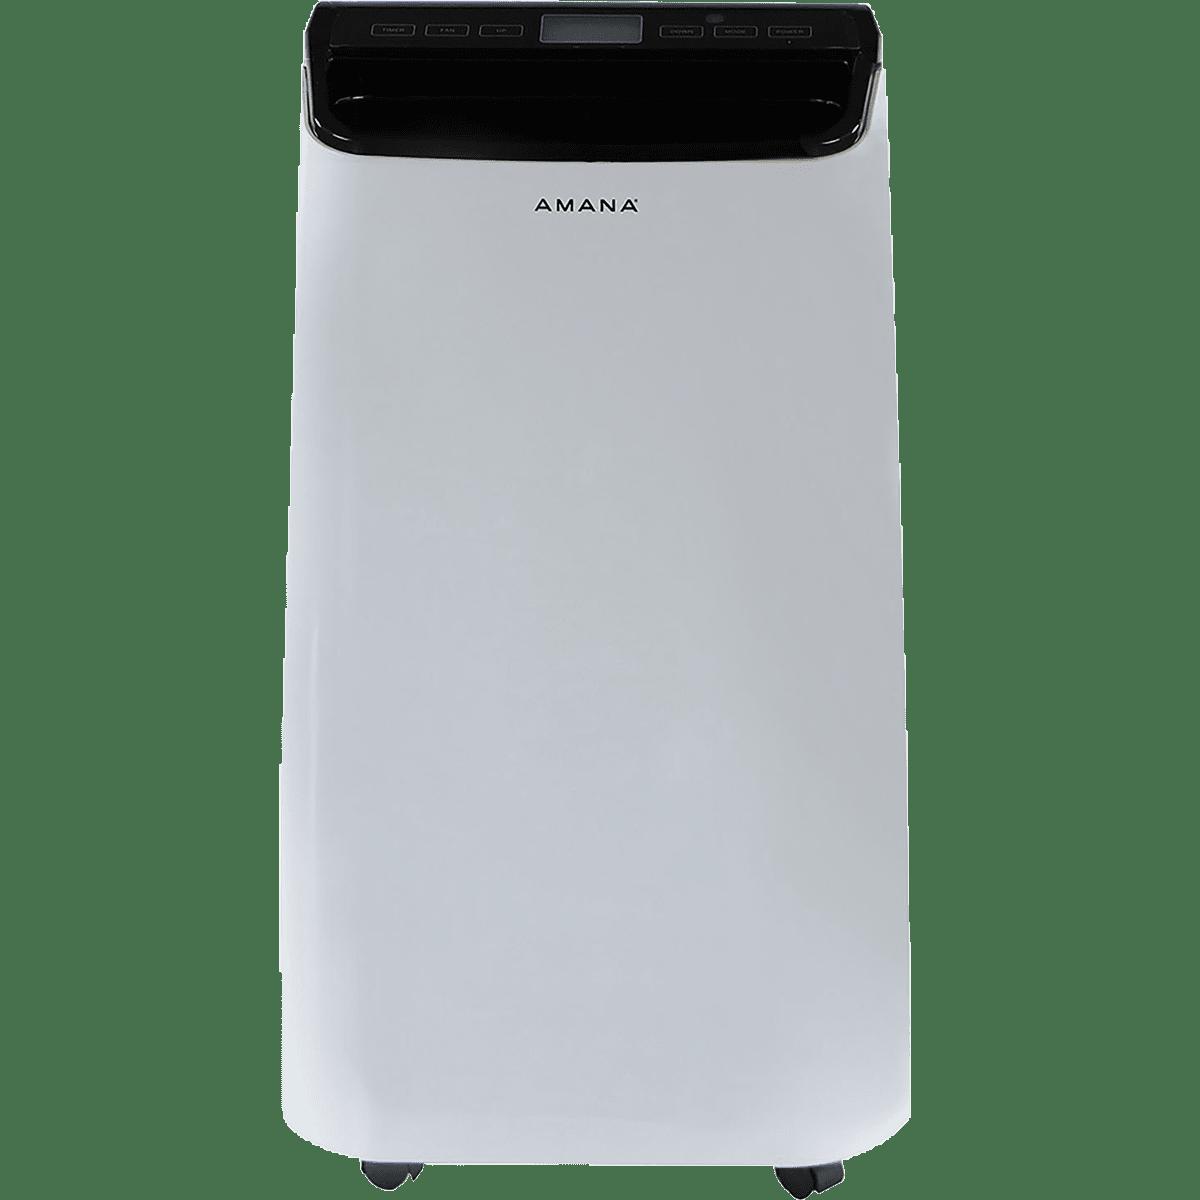 Amana Portable Air Conditioner am7500